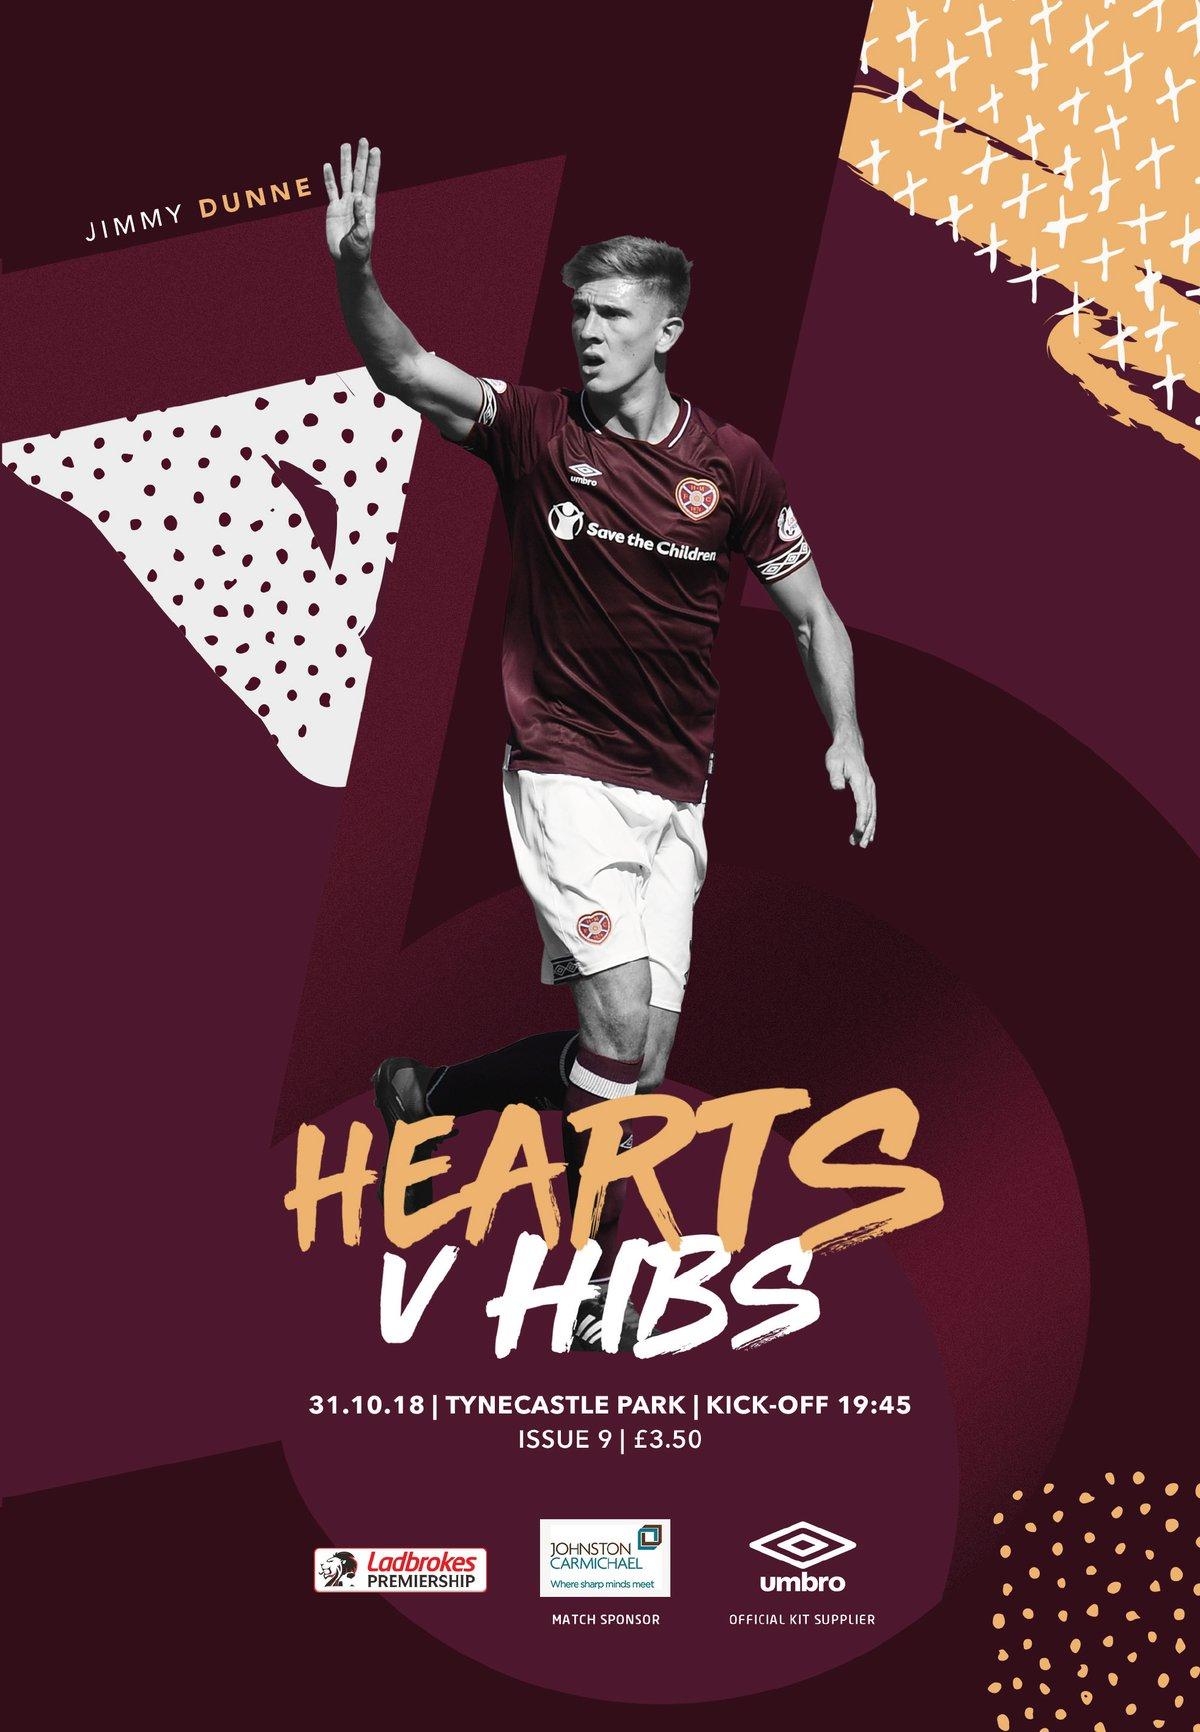 Image of Hearts v Hibs, 31st October 2018